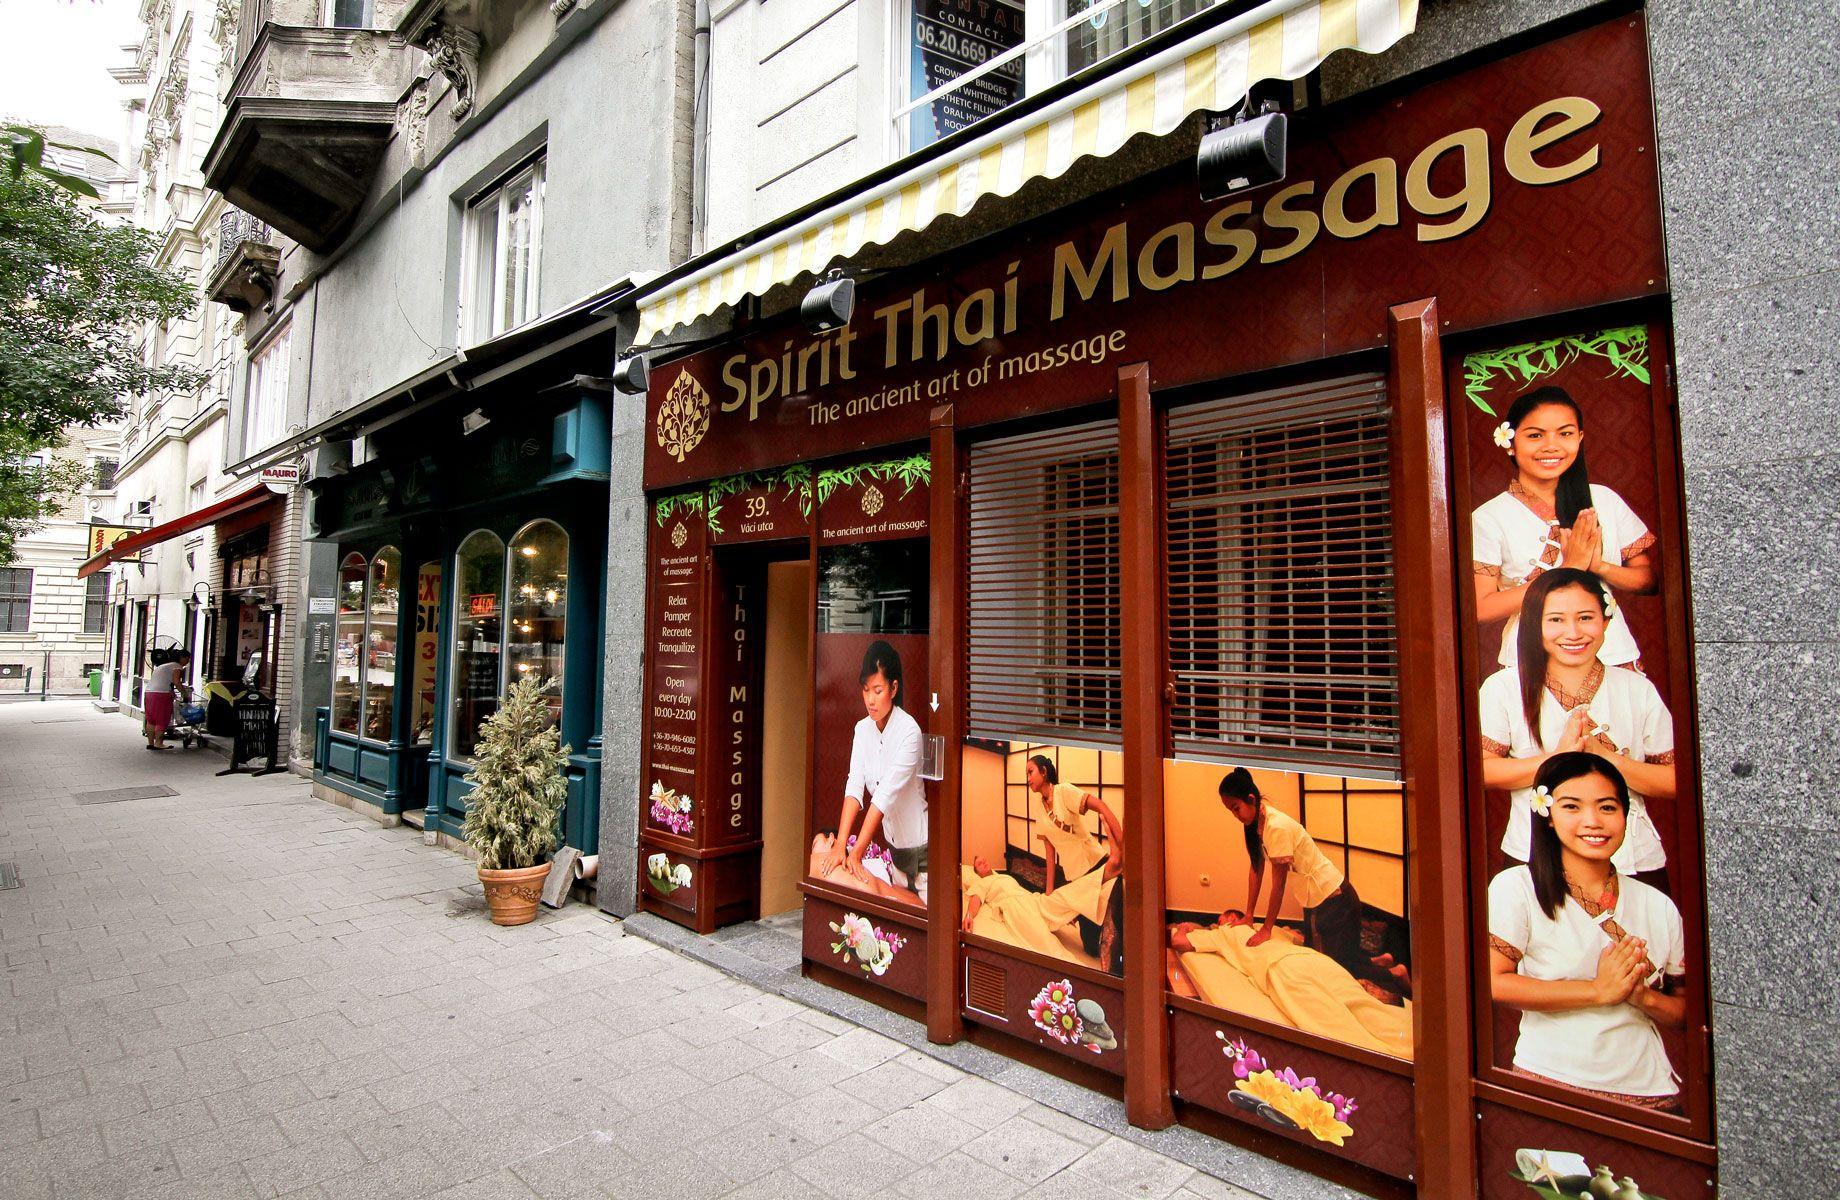 tip thai massage tantra massage i göteborg